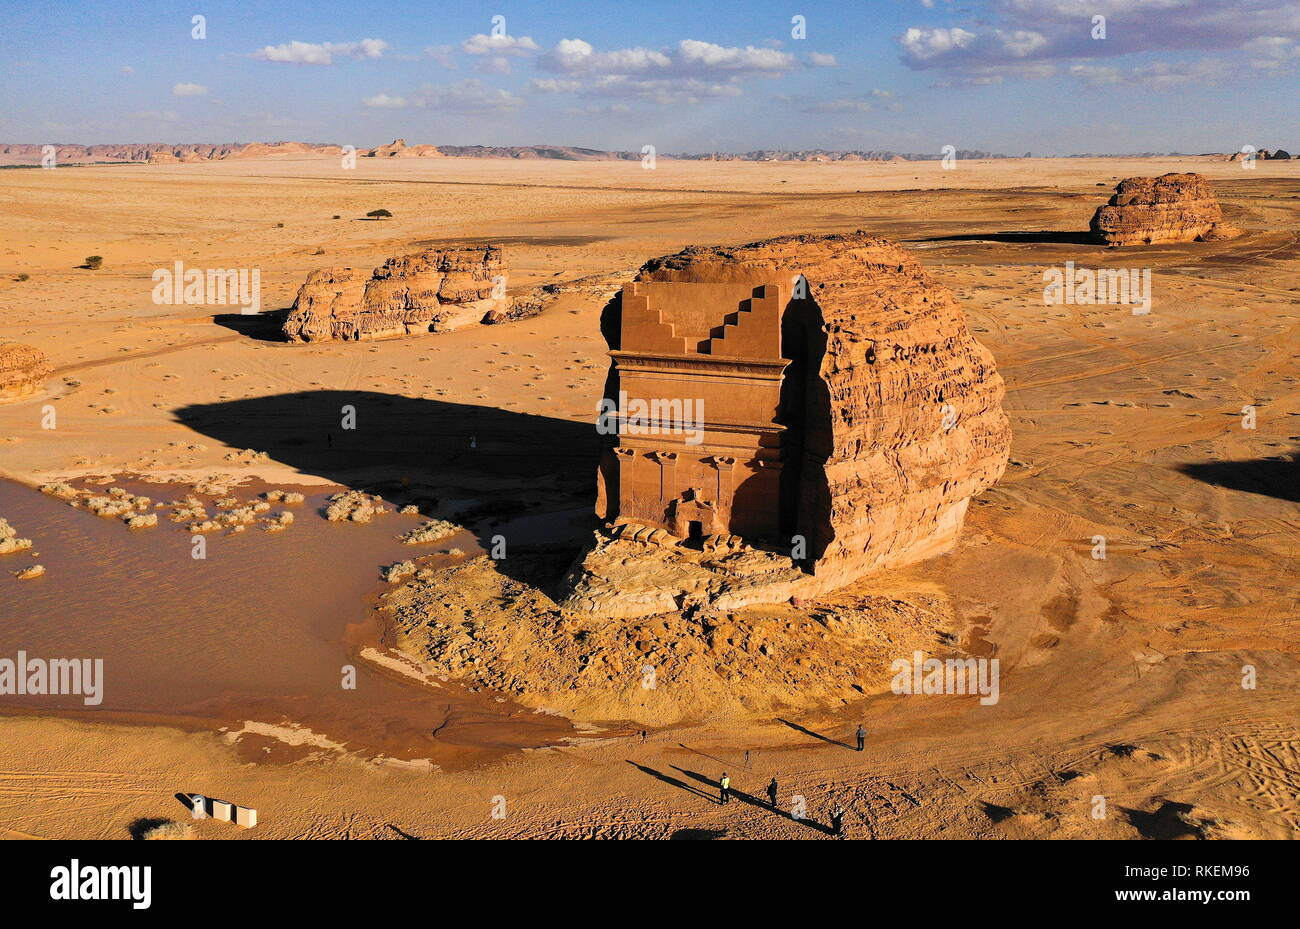 Al Ula, Saudi Arabia. 10th Feb, 2019. AL-ULA, SAUDI ARABIA - FEBRUARY 10, 2019: Madain Saleh, a UNESCO World Heritage site, in Medina Region. Valery Sharifulin/TASS Credit: ITAR-TASS News Agency/Alamy Live News - Stock Image